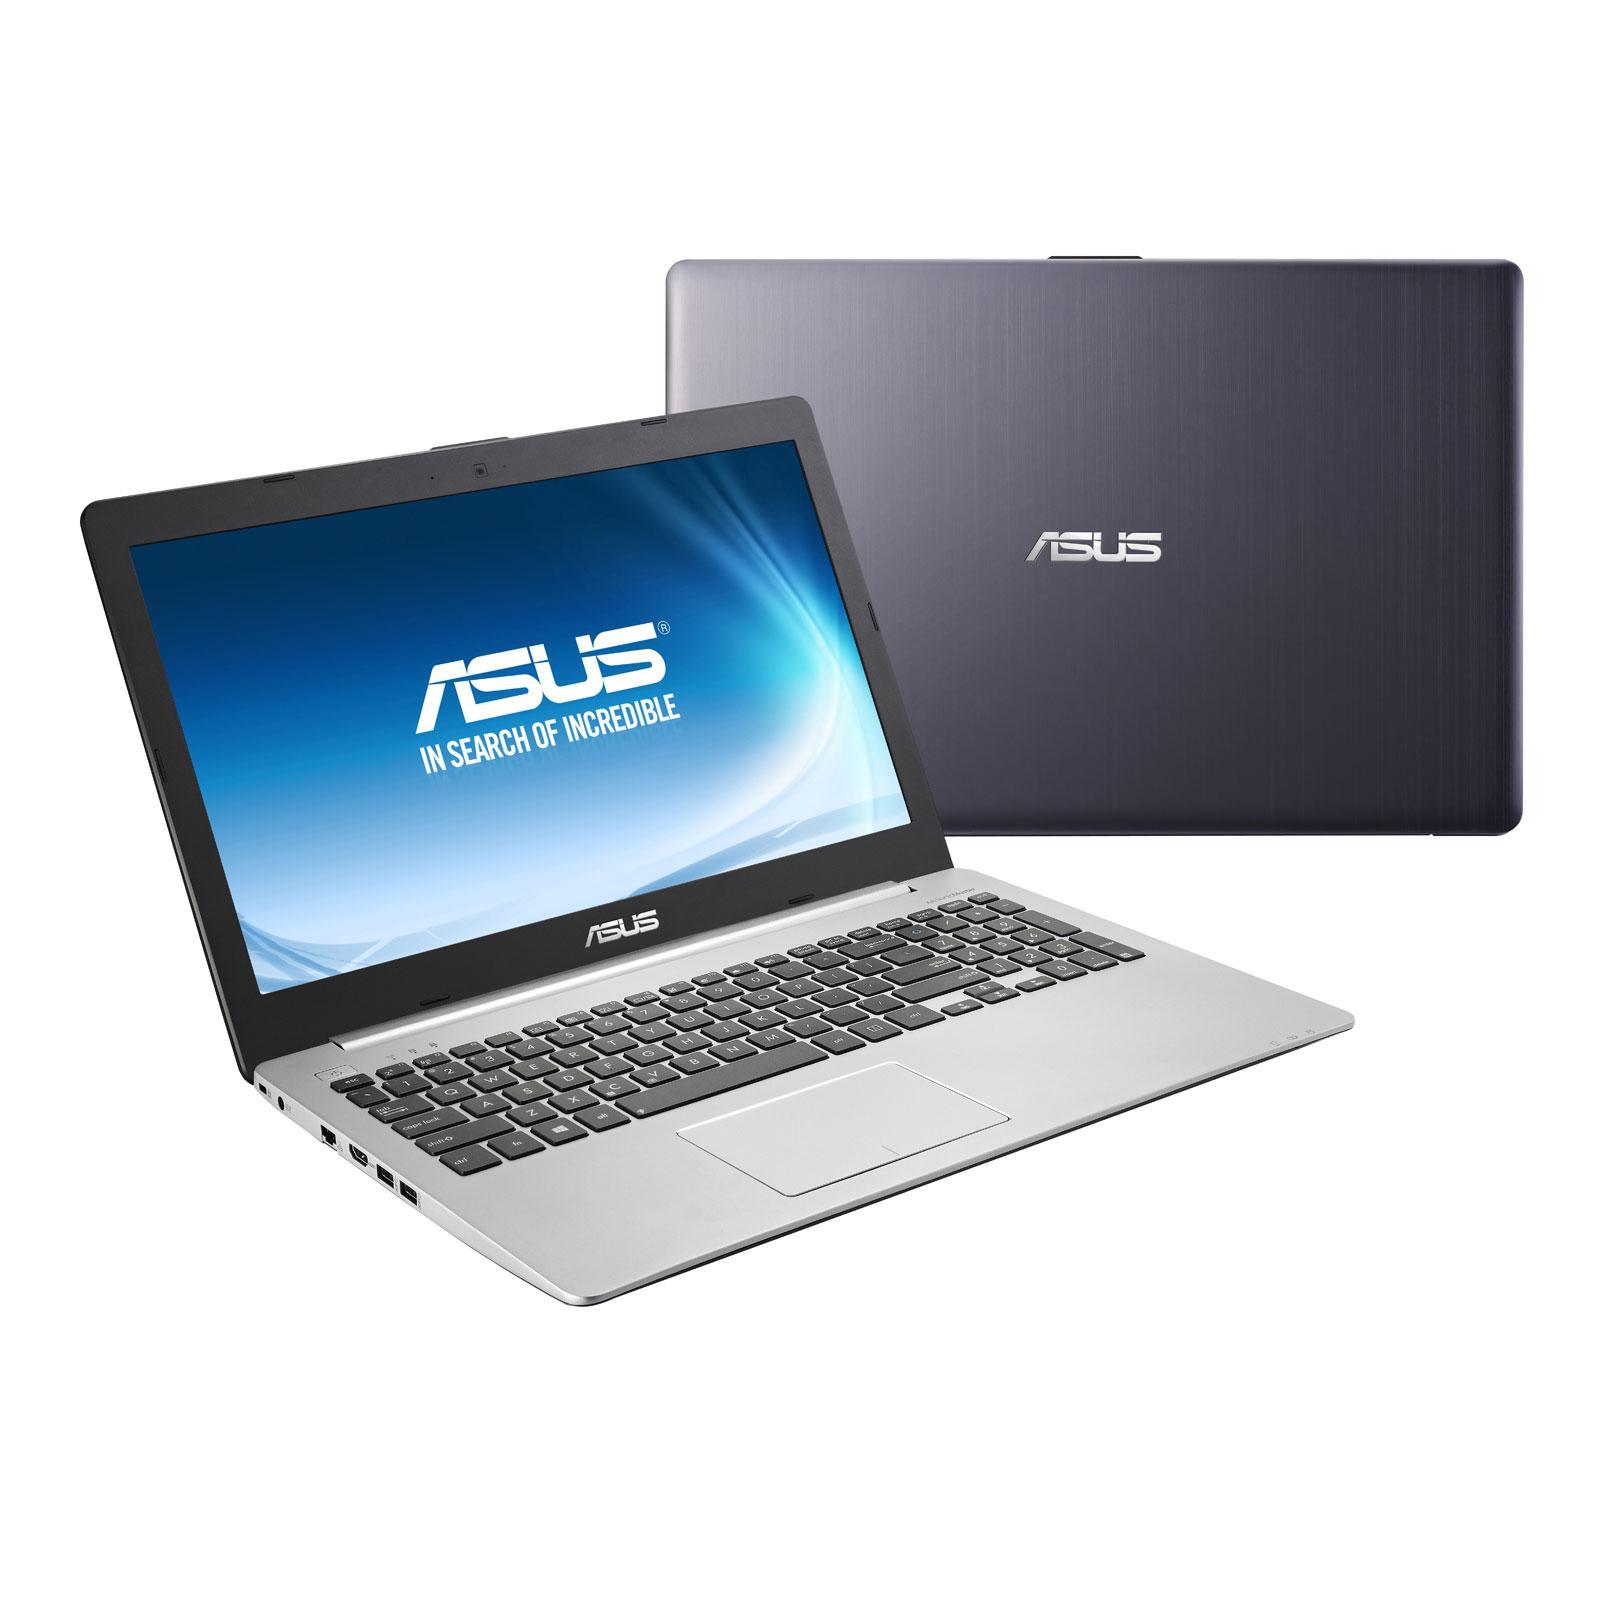 PC portable Asus UX32LA-R3012H - i5-4200U 1,6 GHz, HDD 500 Go, RAM 4 Go (Reconditionné)